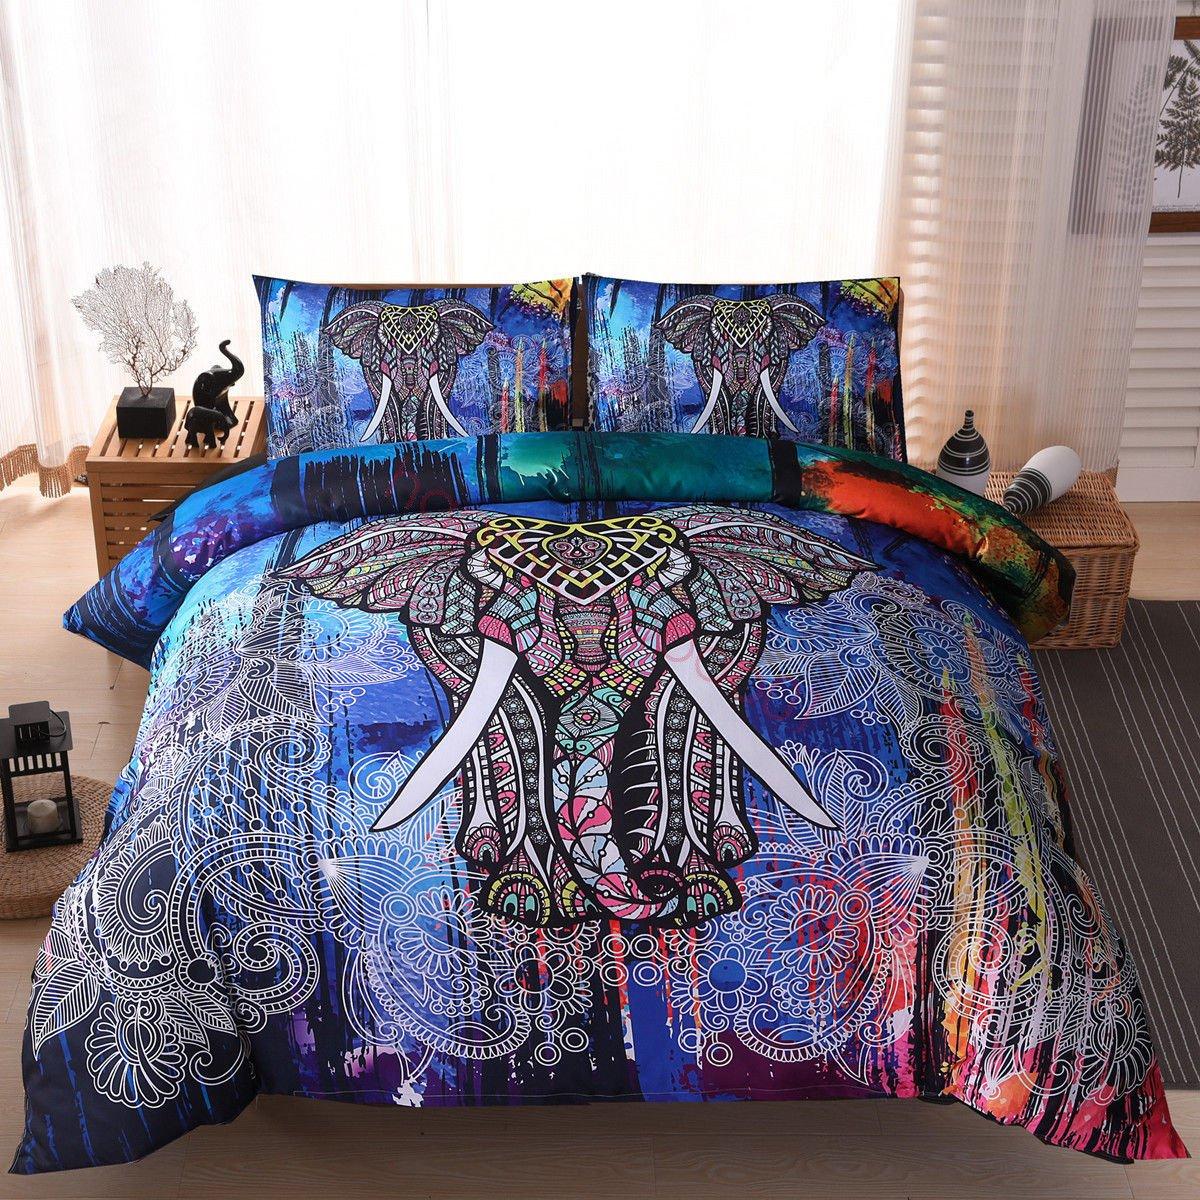 (006) Mandala Comforter Bedding Cover Colorful Elephant Boho India Duvet Covers Set